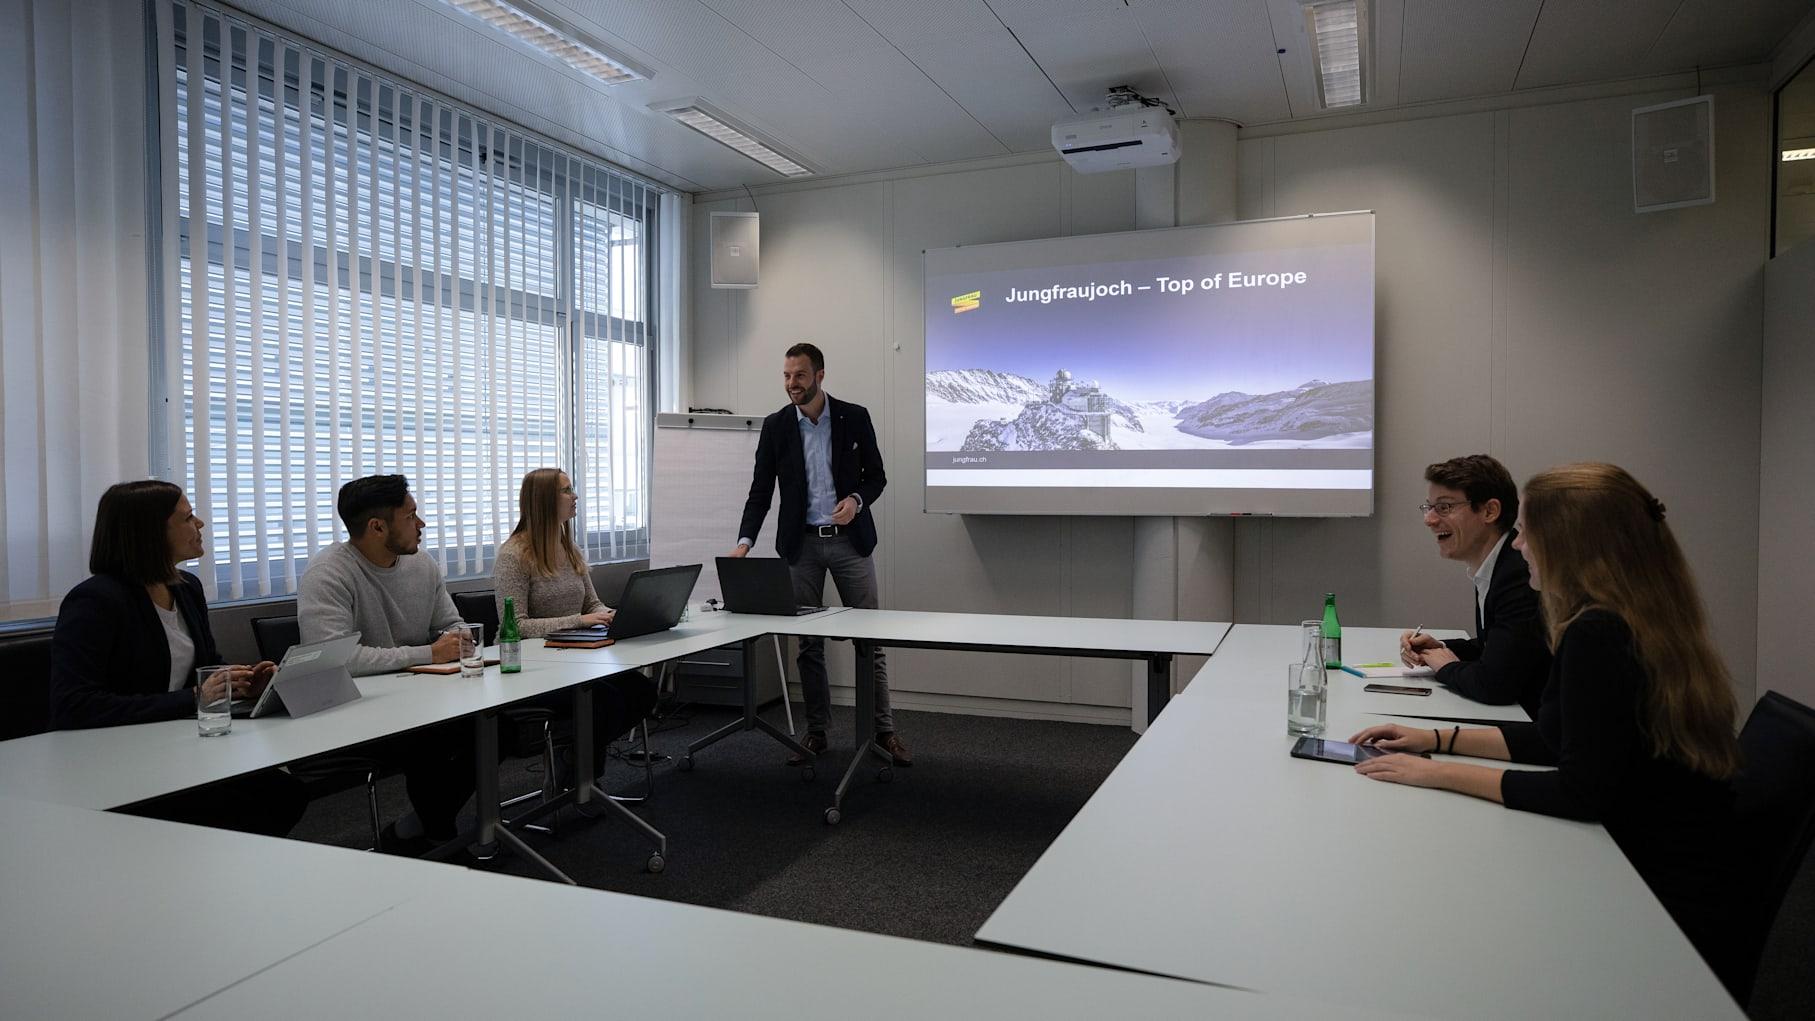 Marketing Sales Brentani Kaeser Tschabold Schmid Egger Balmer